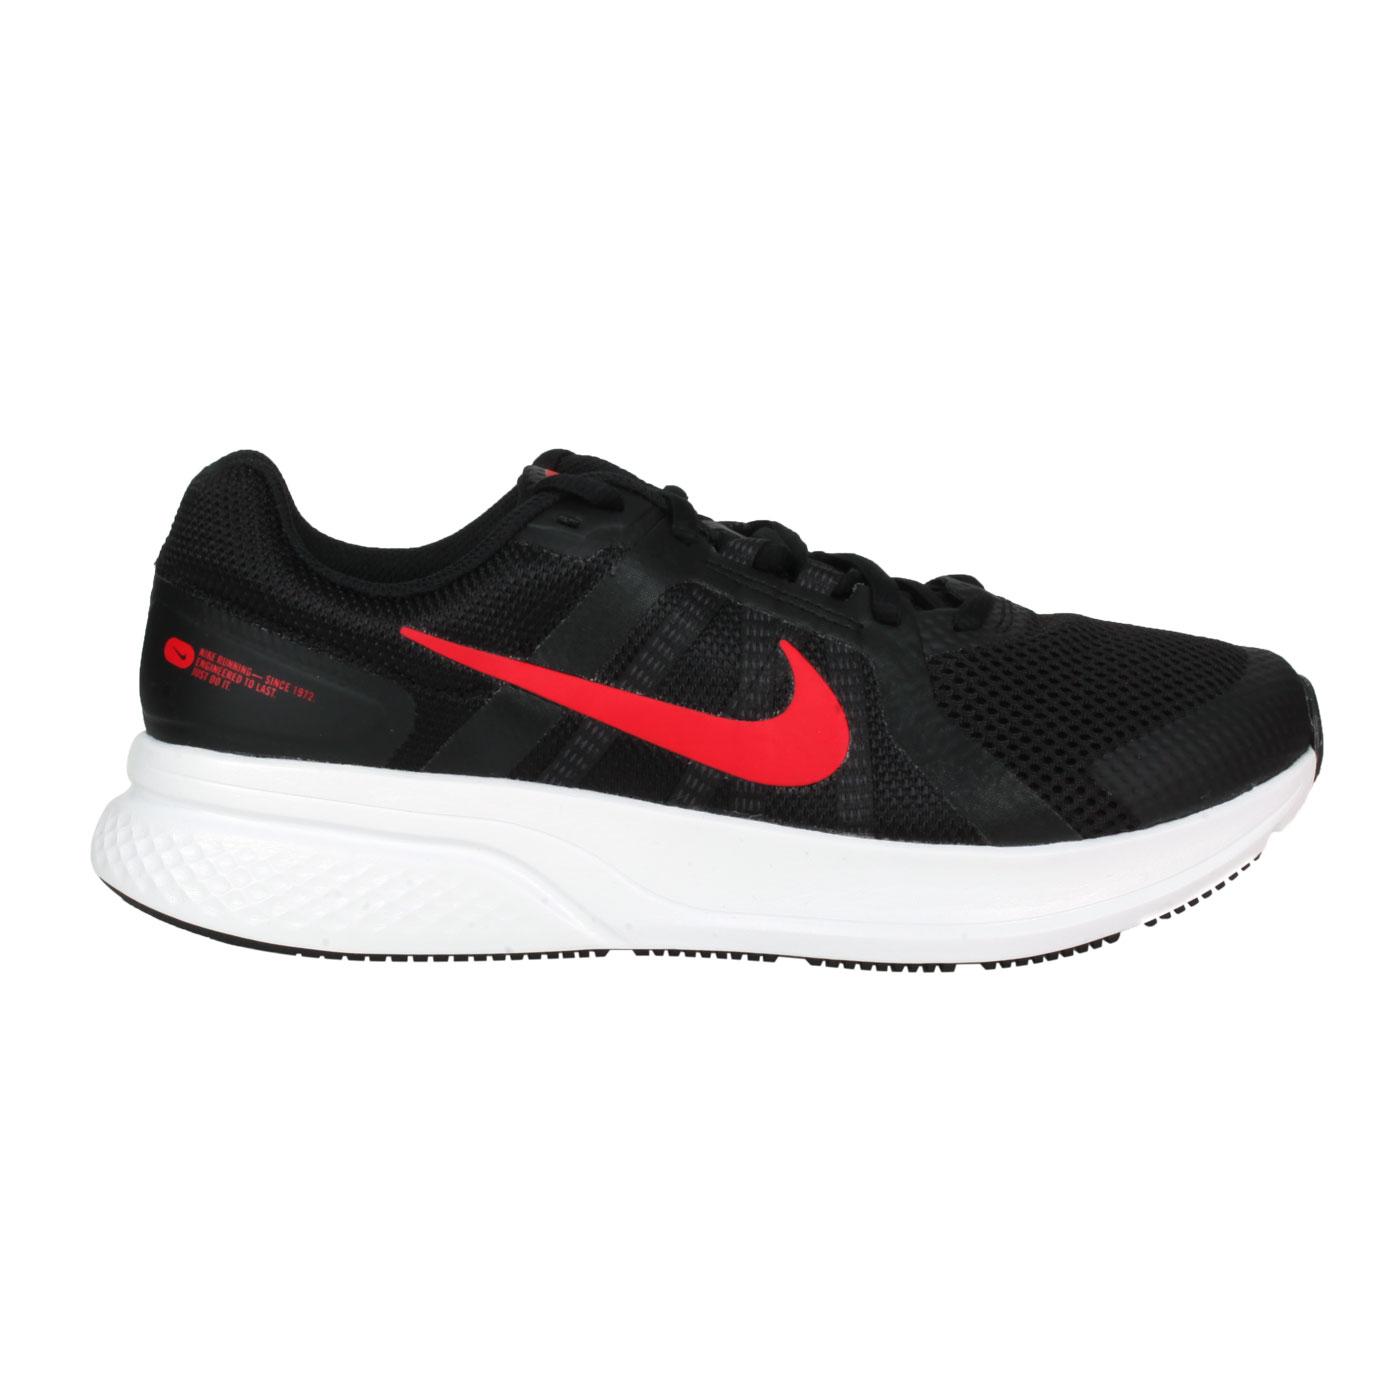 NIKE 男款休閒運動鞋  @RUN SWIFT 2@CU3517003 - 黑紅